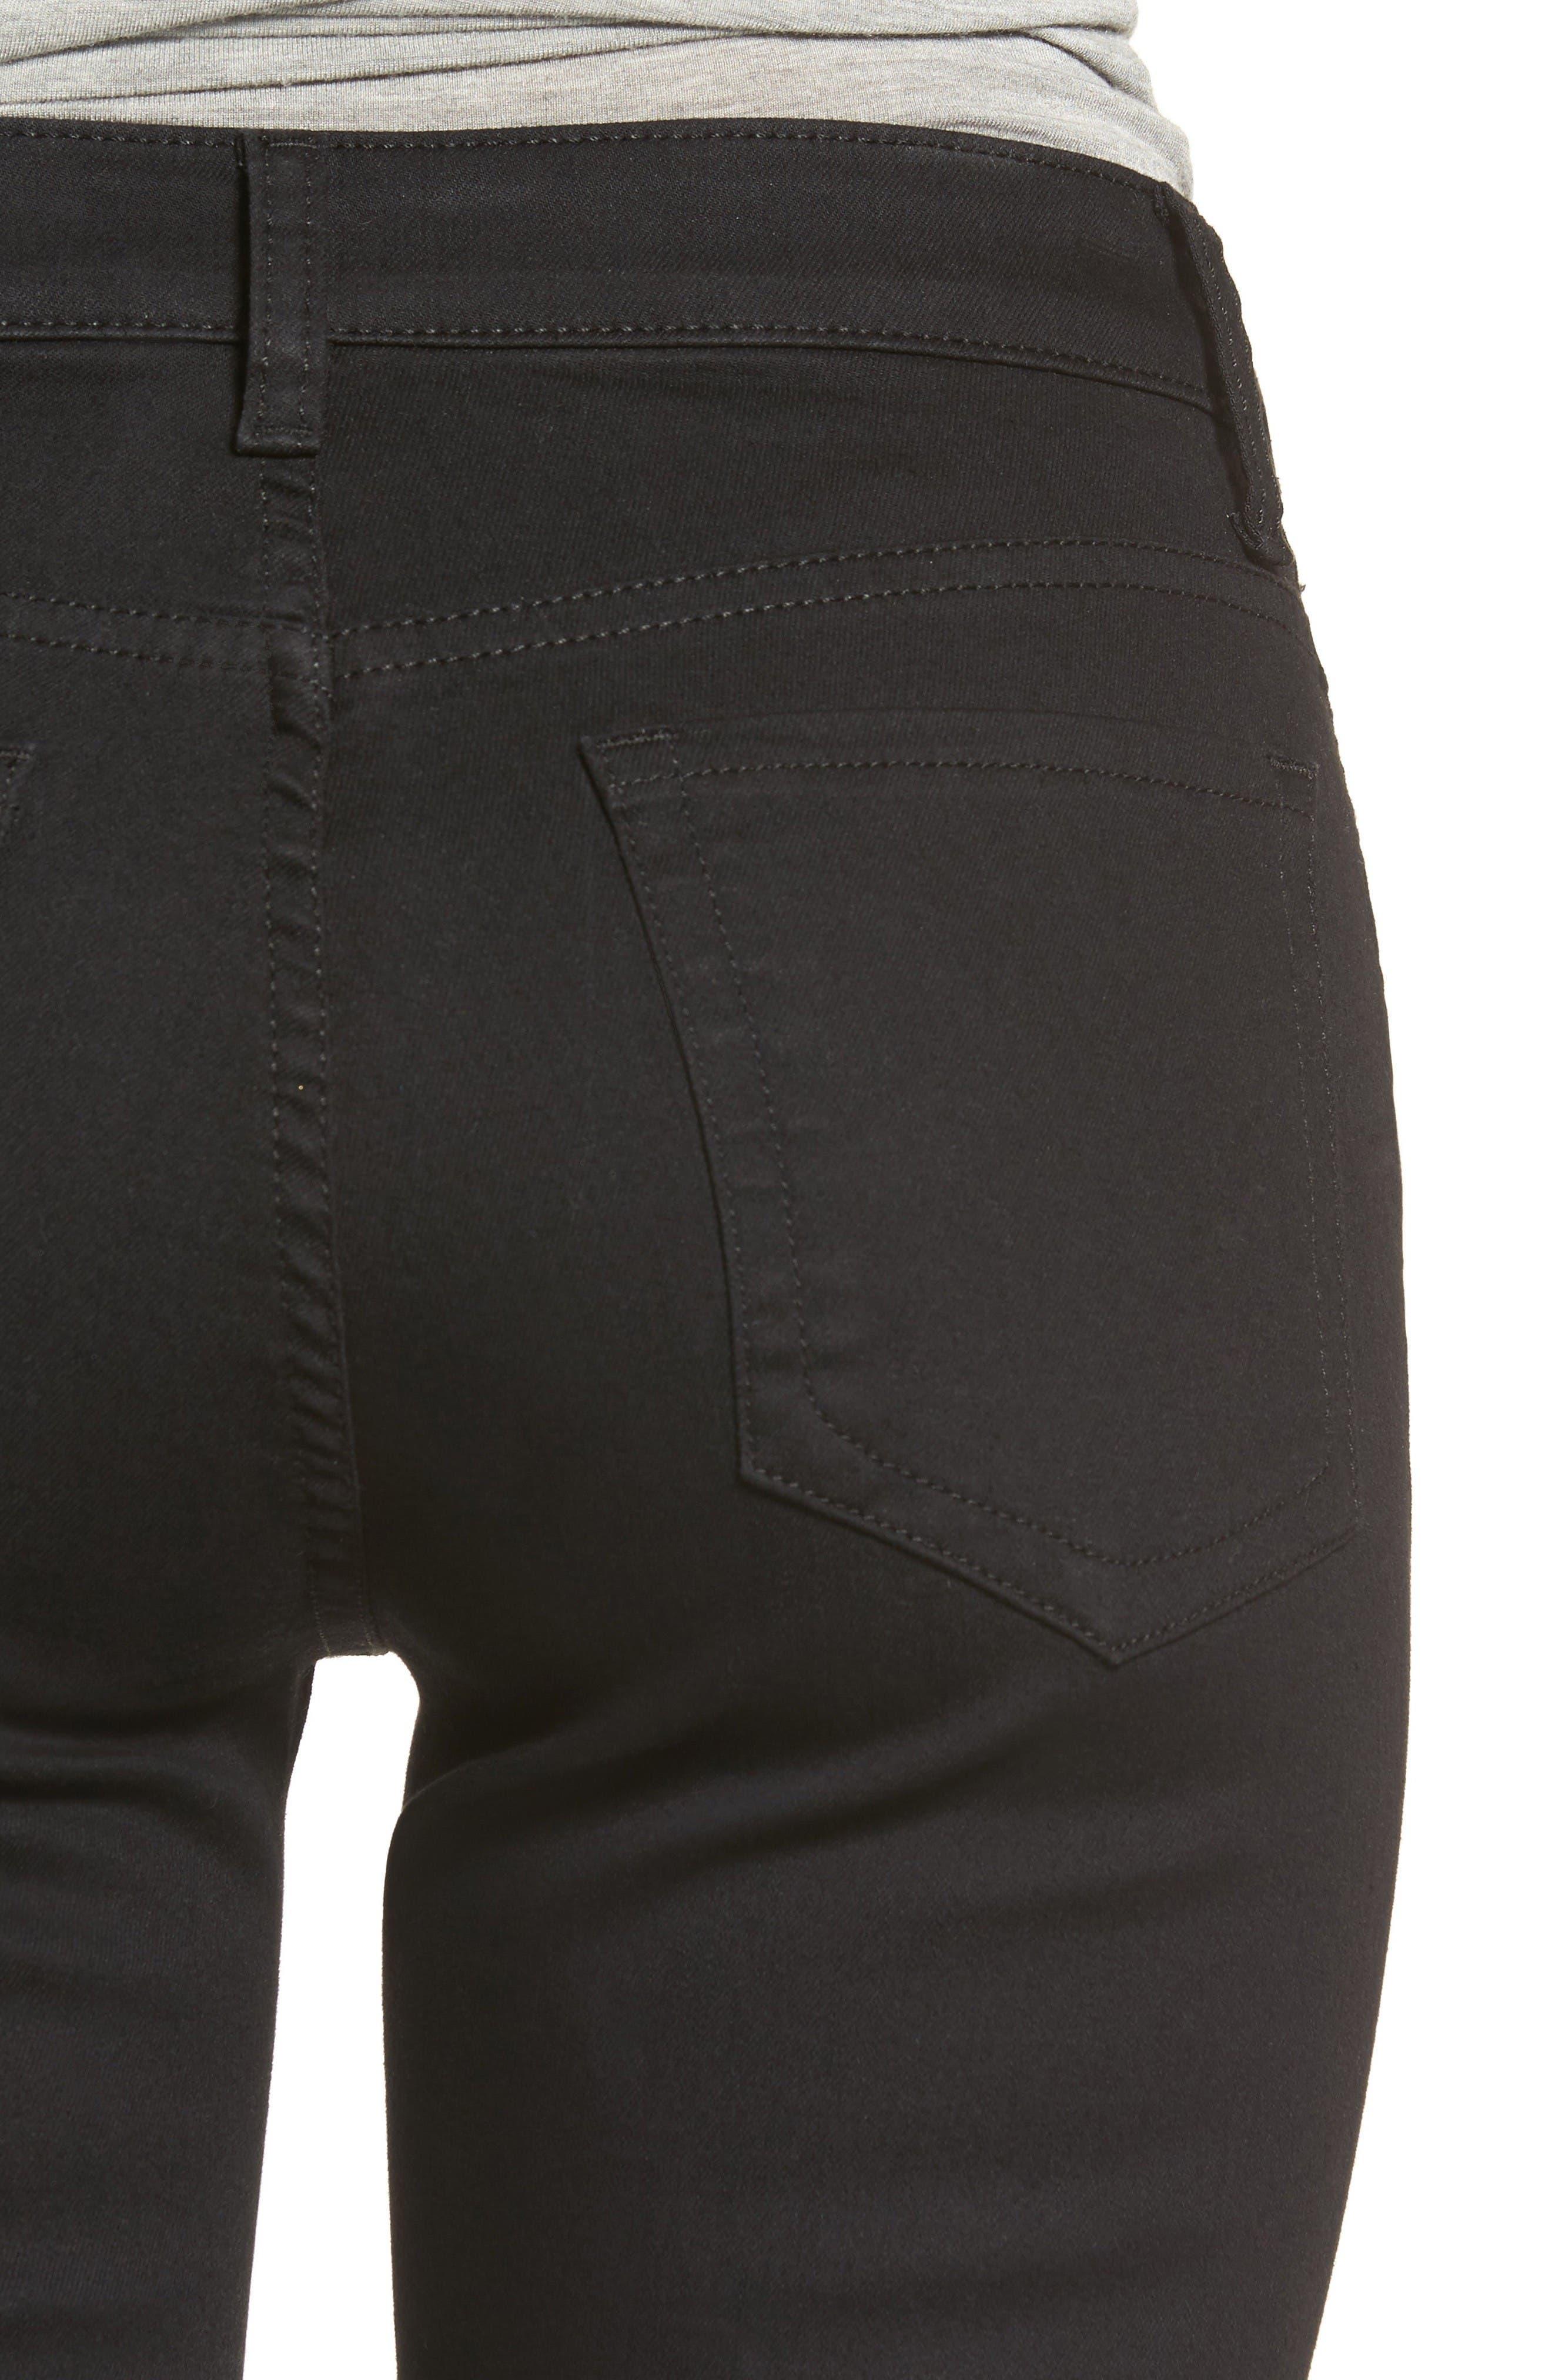 Alternate Image 4  - KUT from the Kloth Diana Stretch Skinny Jeans (Regular & Petite)